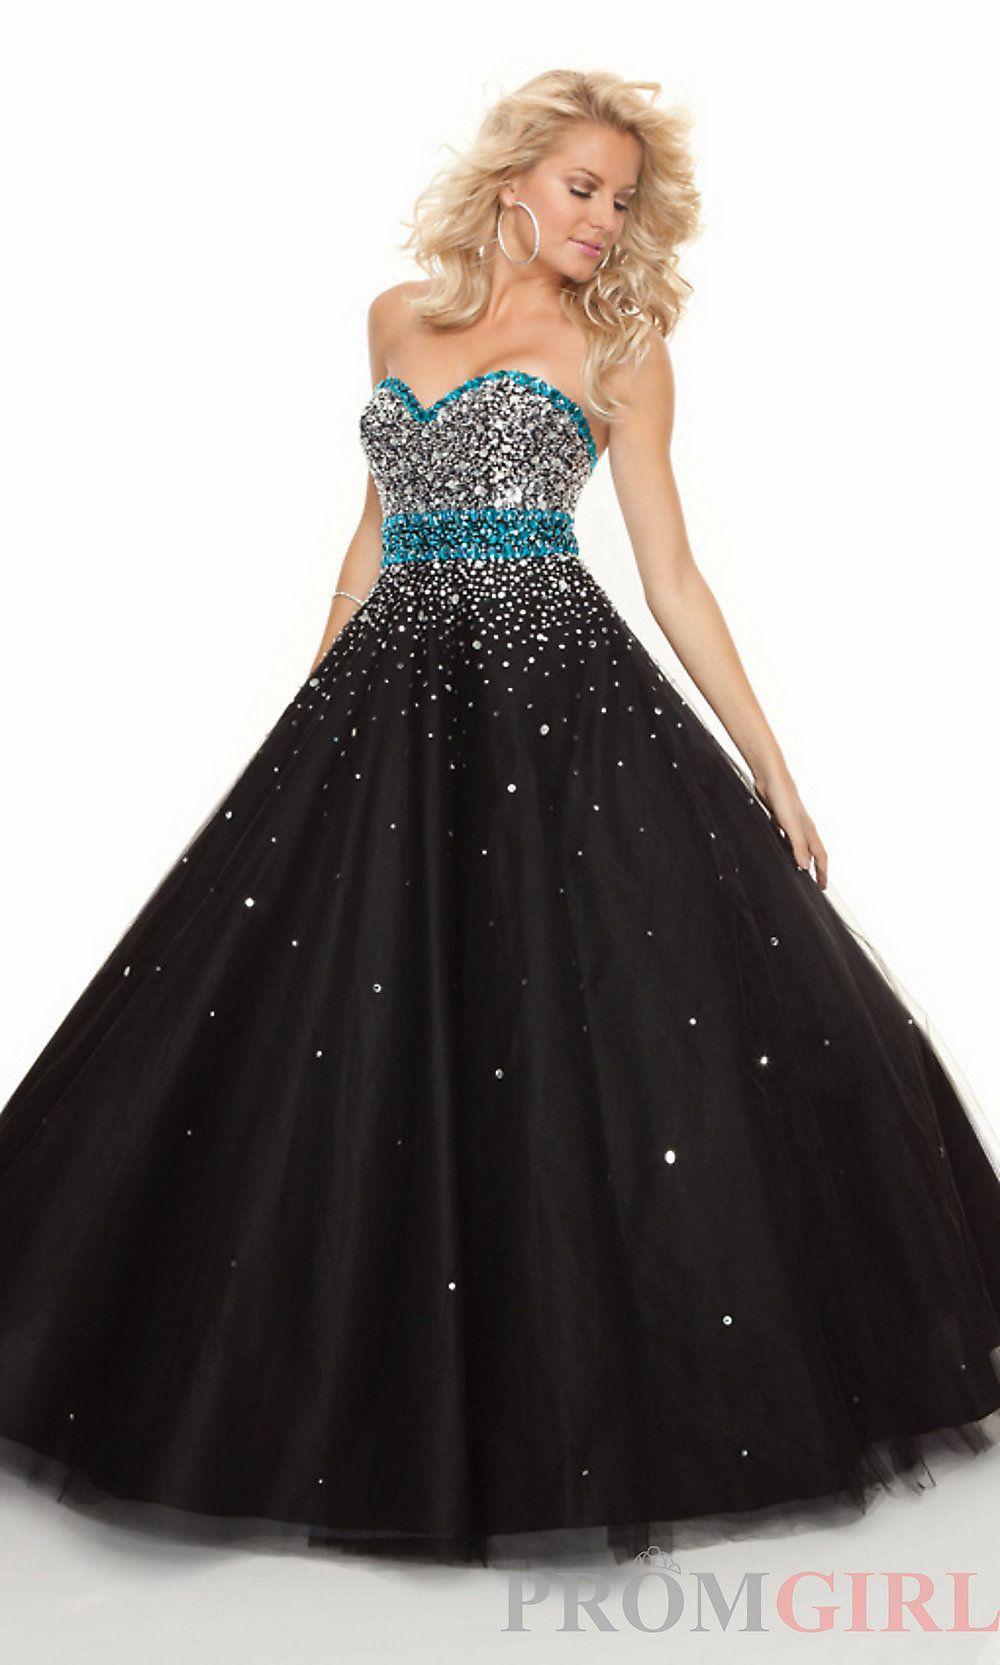 ball gown dresses for girls | Beaded Black Ball Gowns, Mori Lee ...